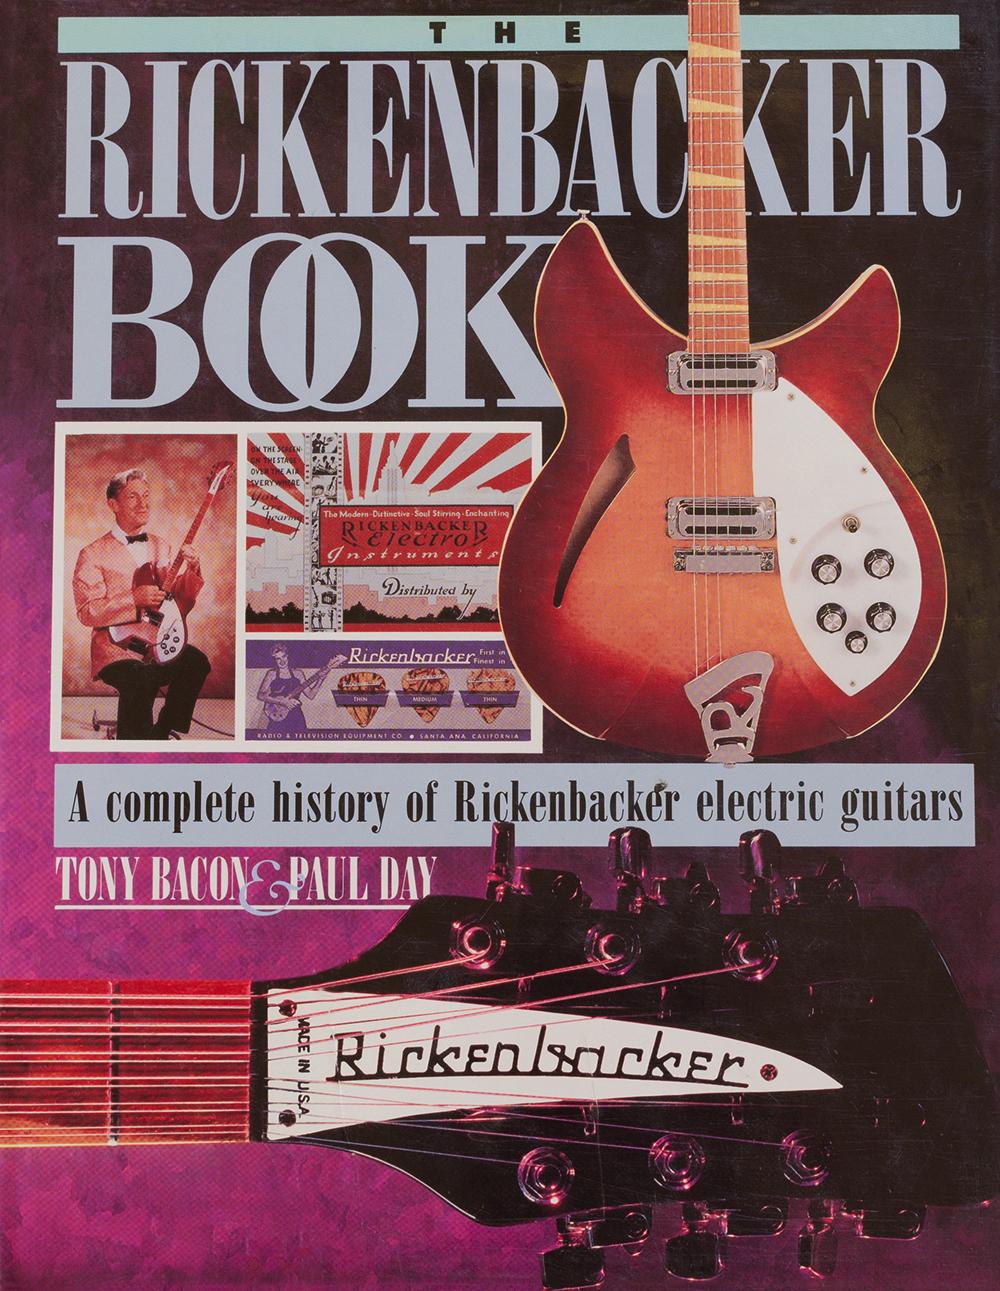 The Green-Glo guitar is 1 of mine that appears in Tony Bacon's fabulous Rickenbacker book